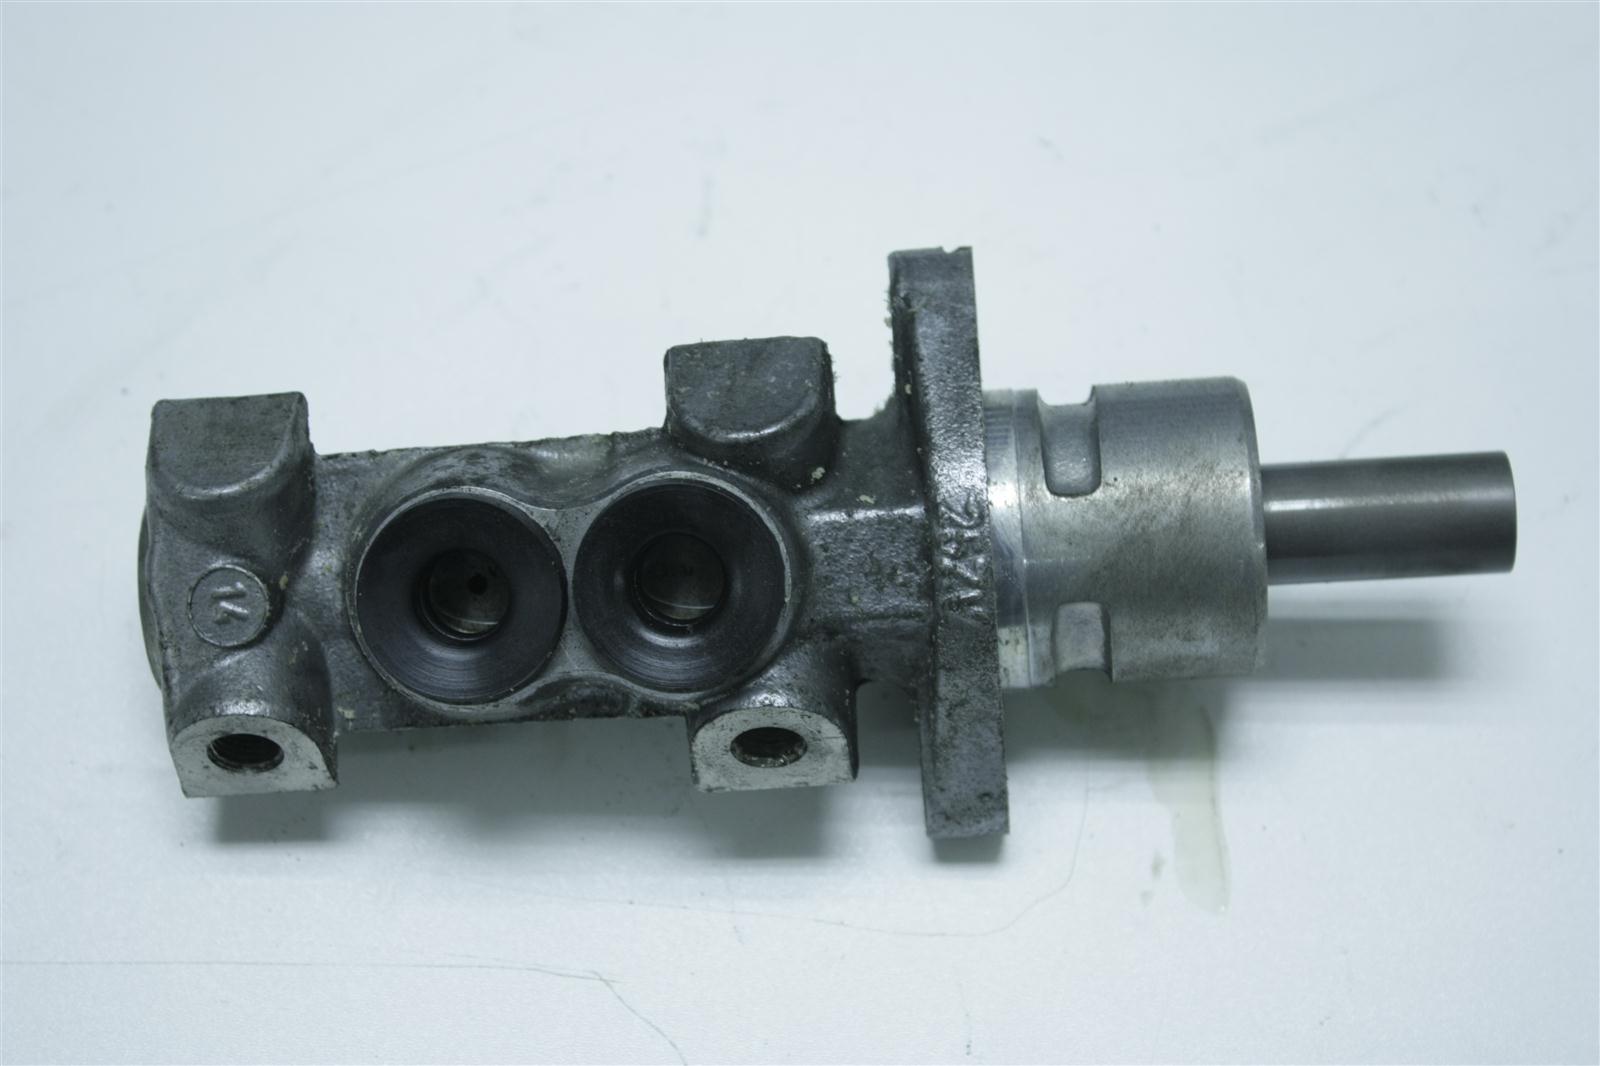 Audi S2/S4/S6 C4/V8/200 20V Hauptbremszylinder ATE ABS 441611021B